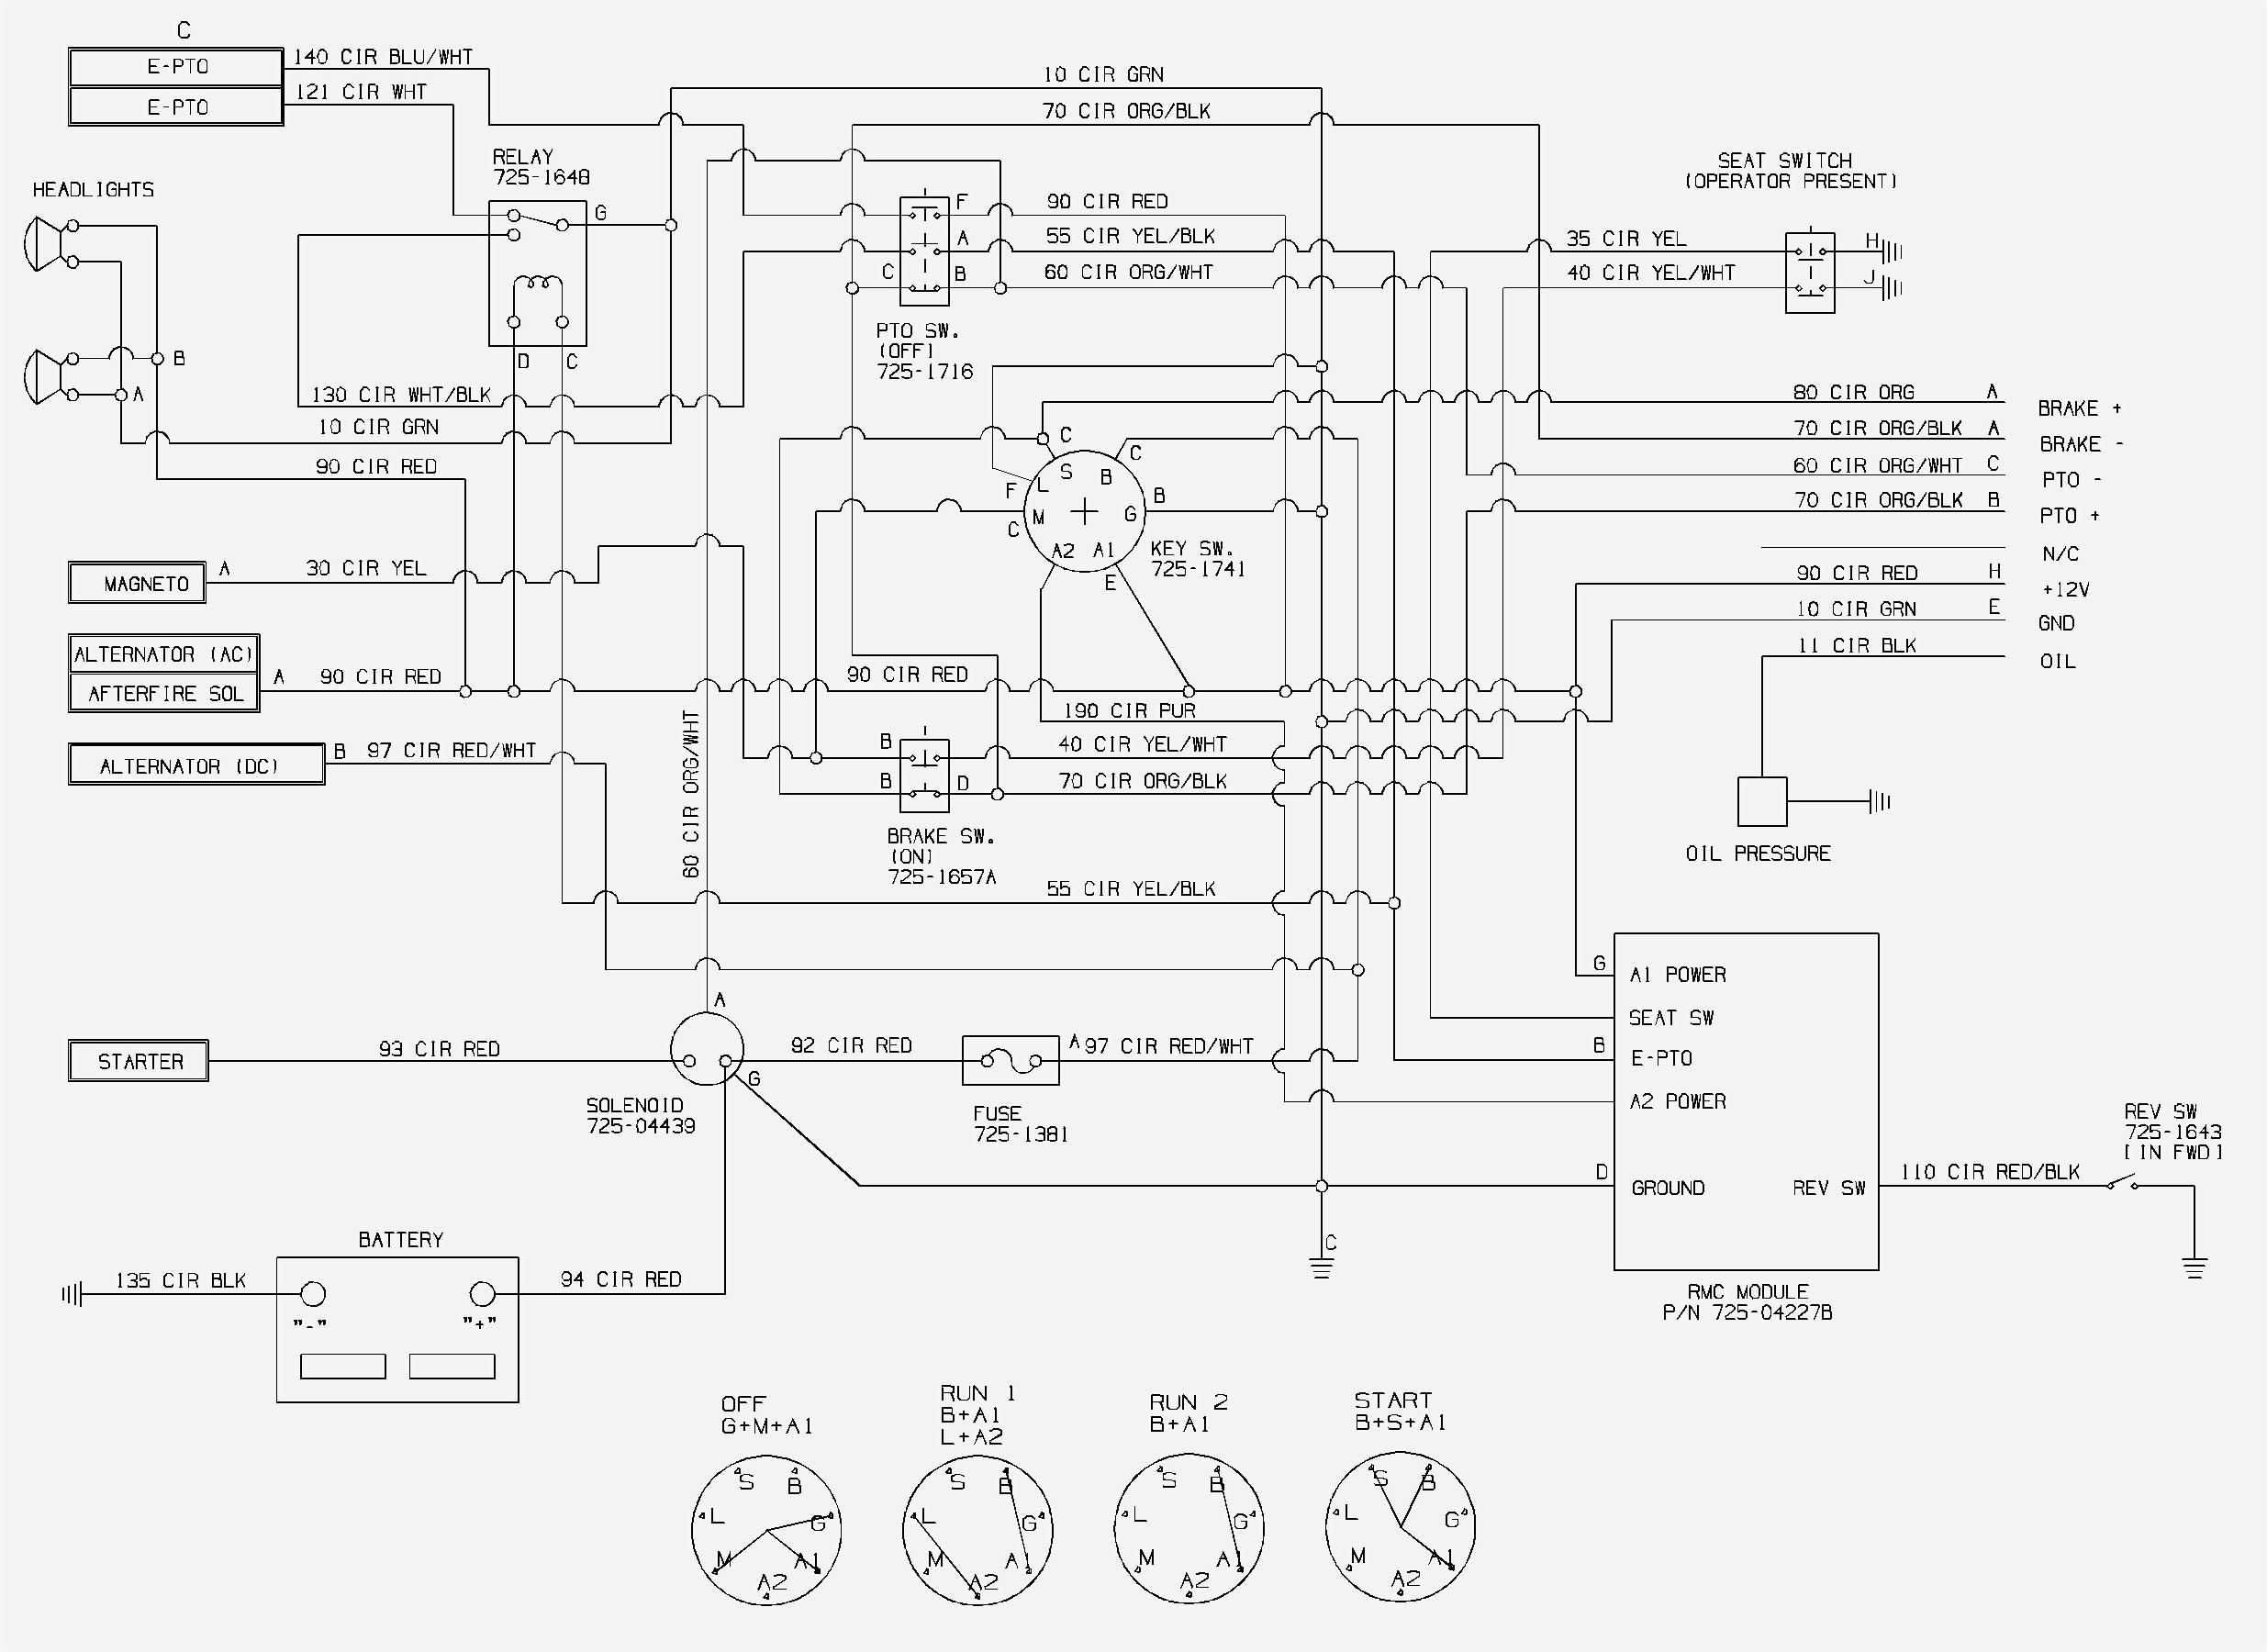 1541 cub cadet wiring diagram manual e books  1541 cub cadet wiring diagram